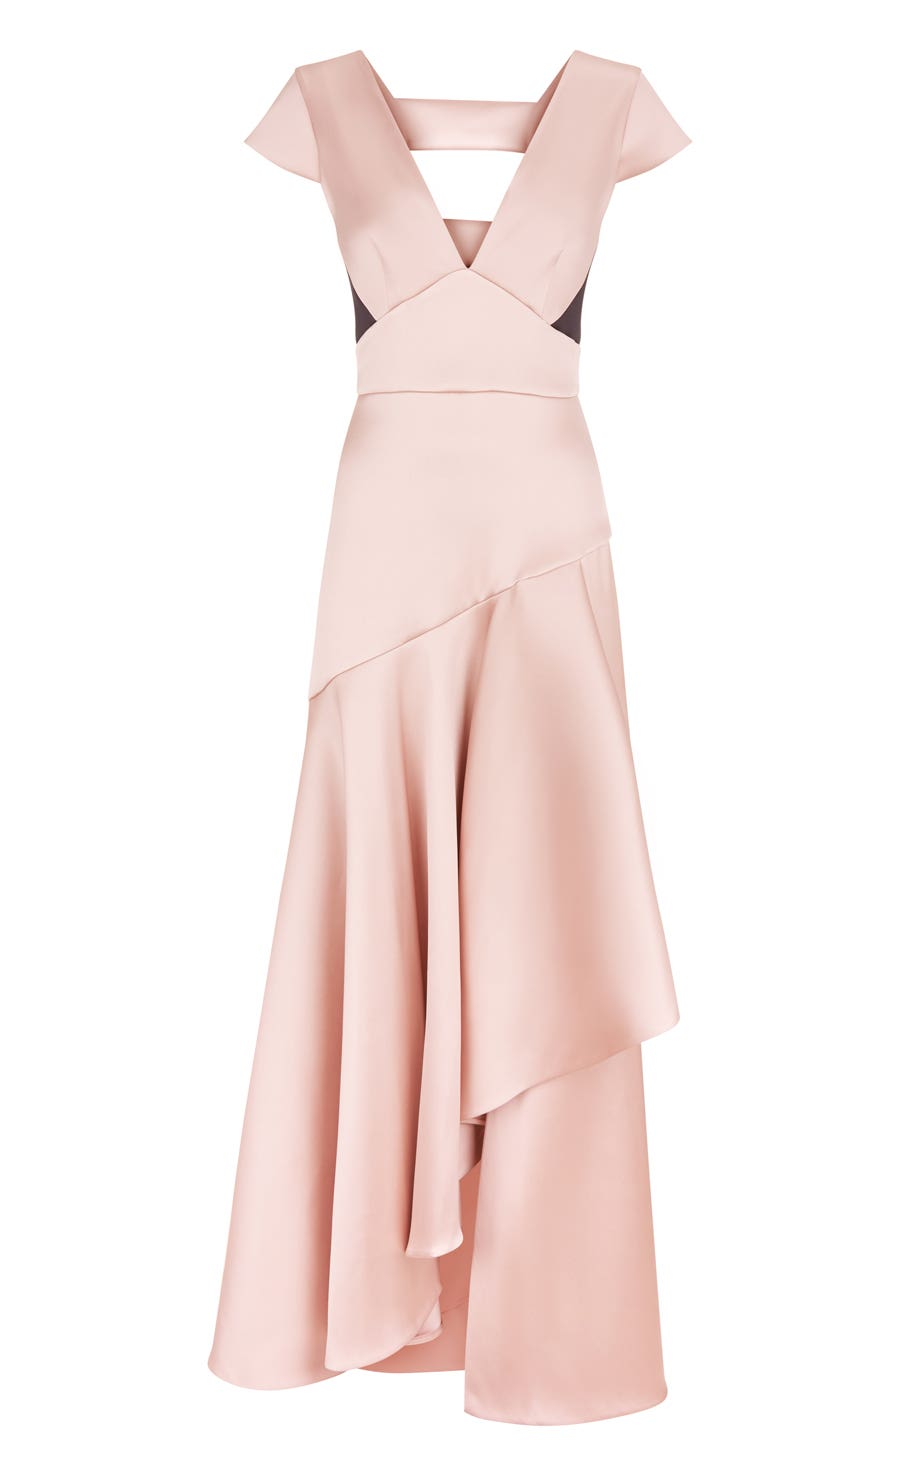 Shield Draped Dress, Blush